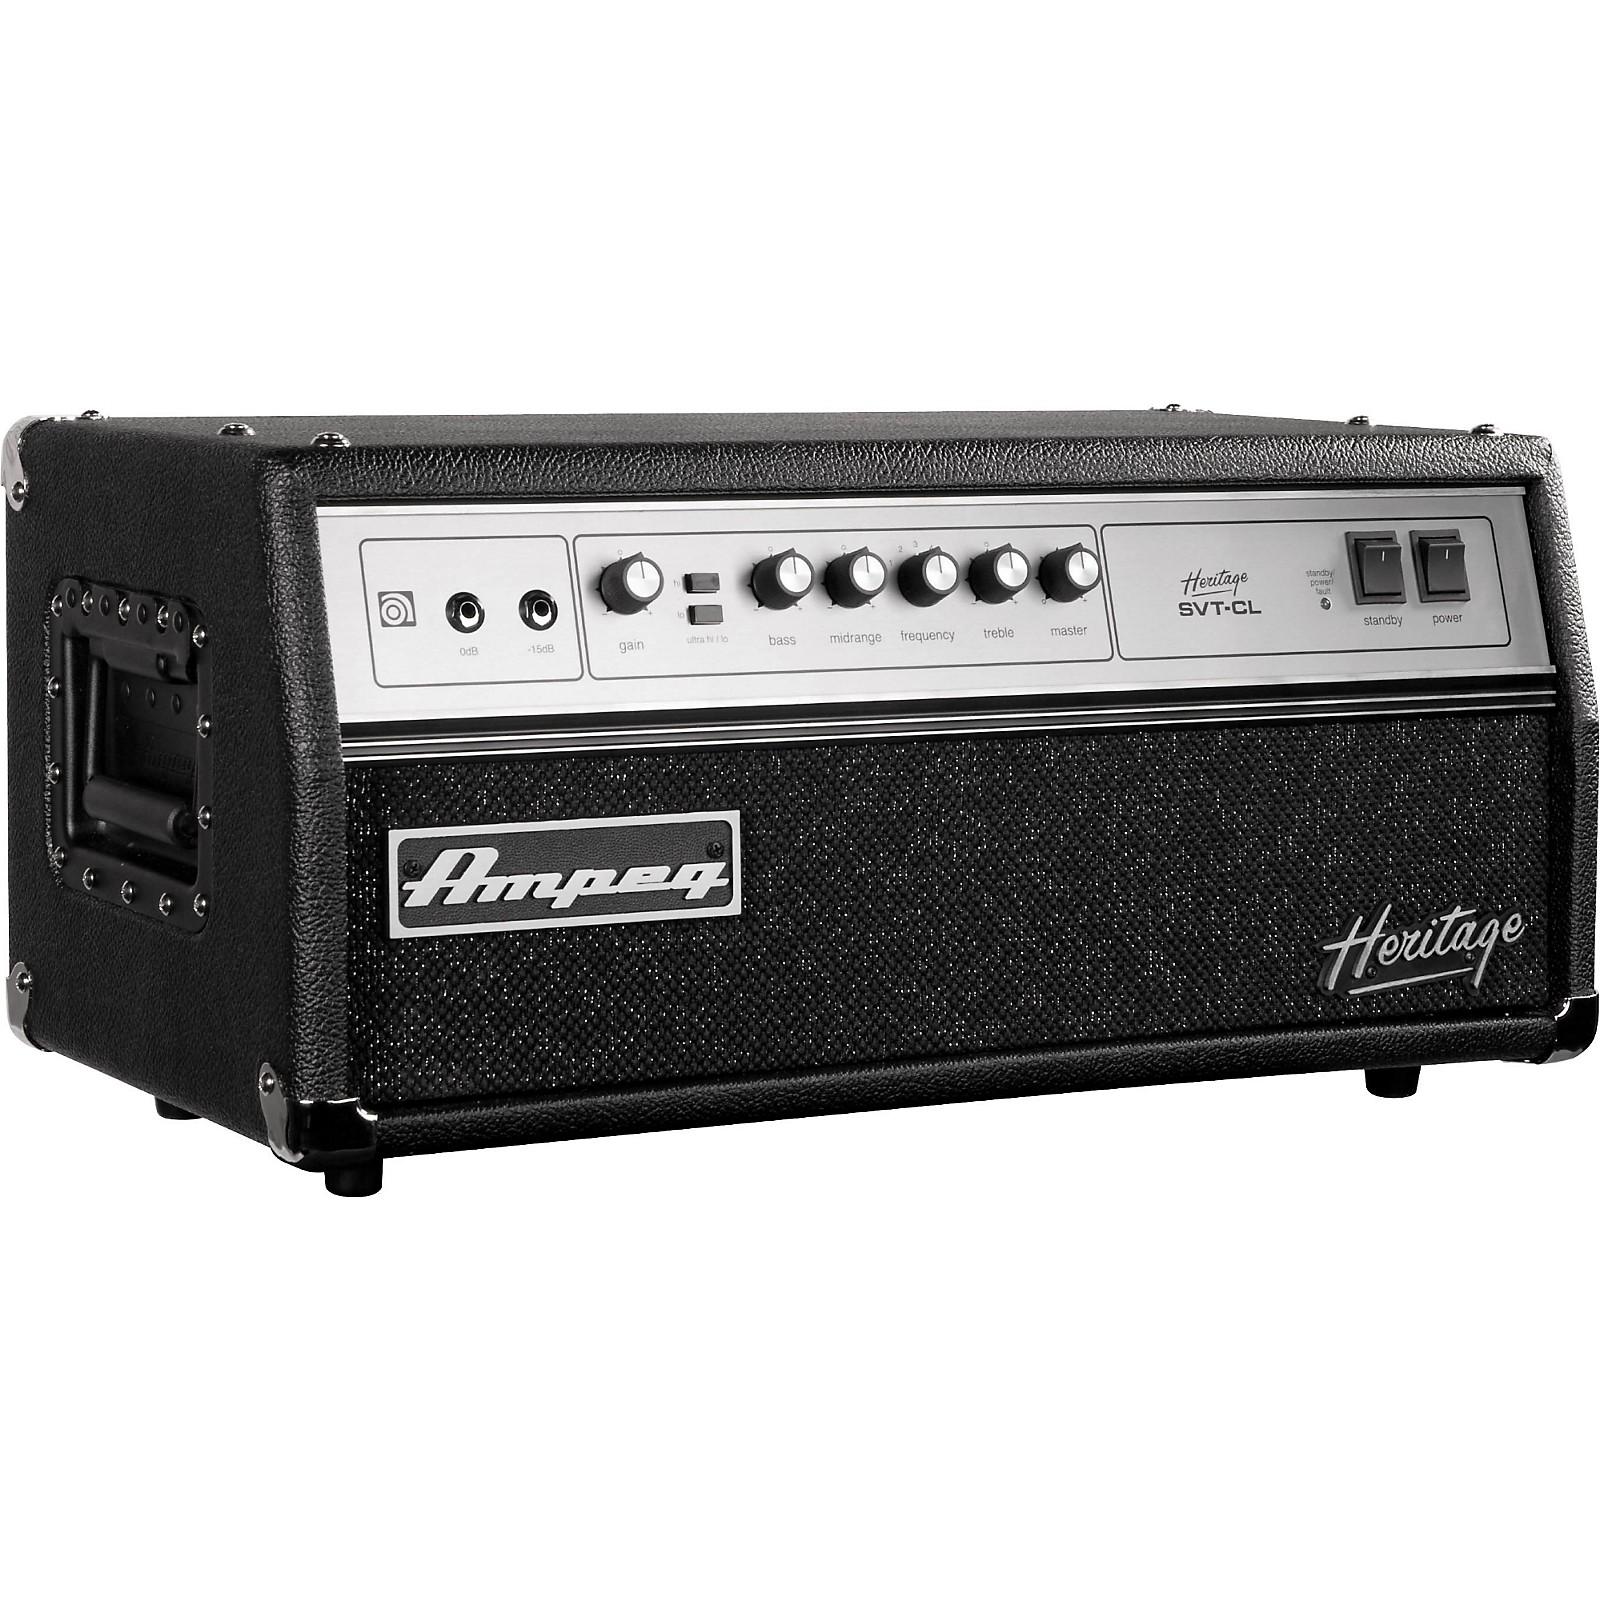 Ampeg Heritage Series SVT-CL 2011 300W Tube Bass Amp Head